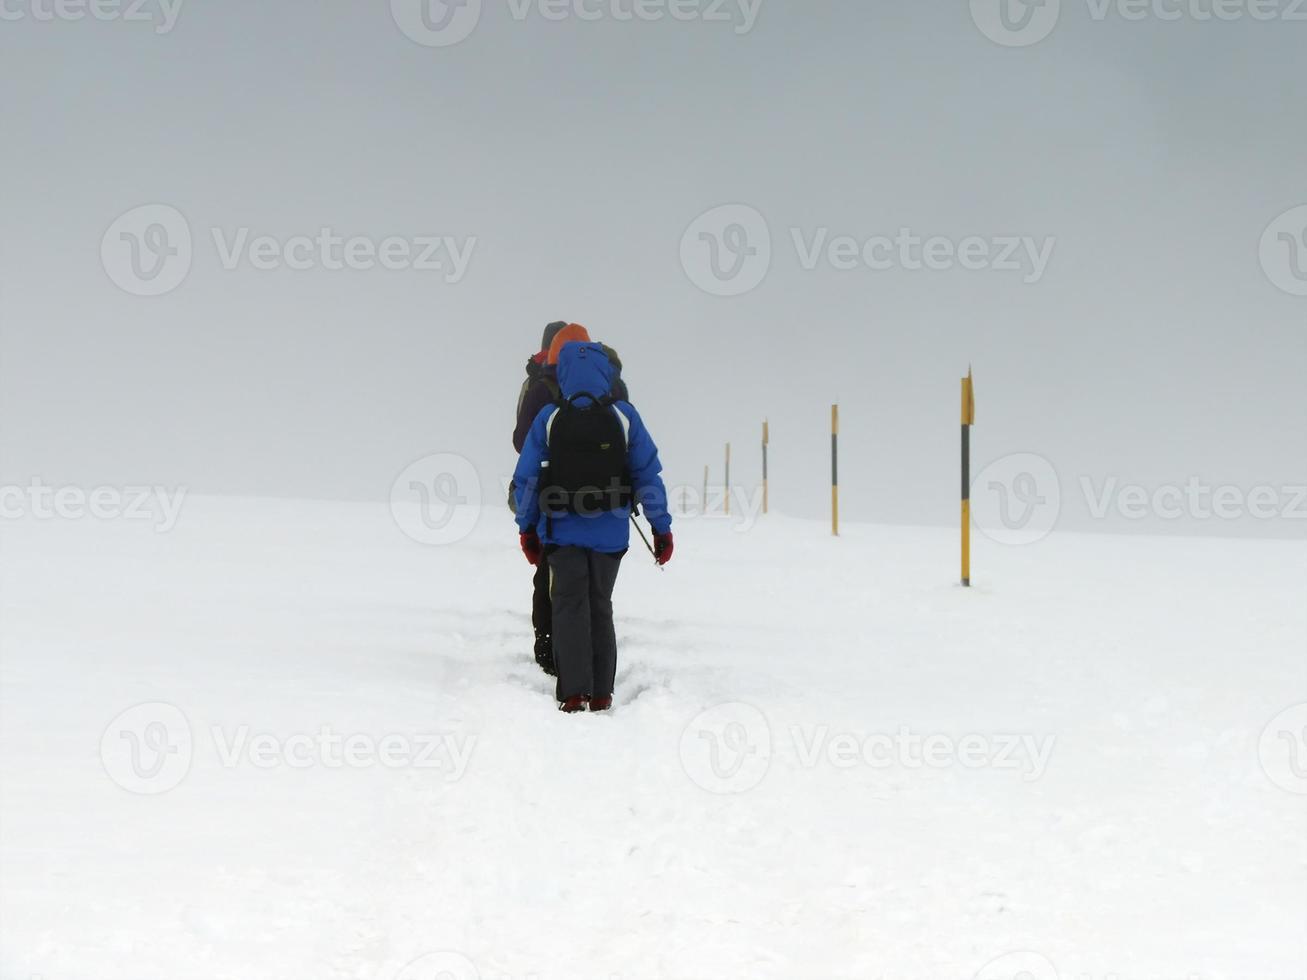 klimmers onder extreme weersomstandigheden foto